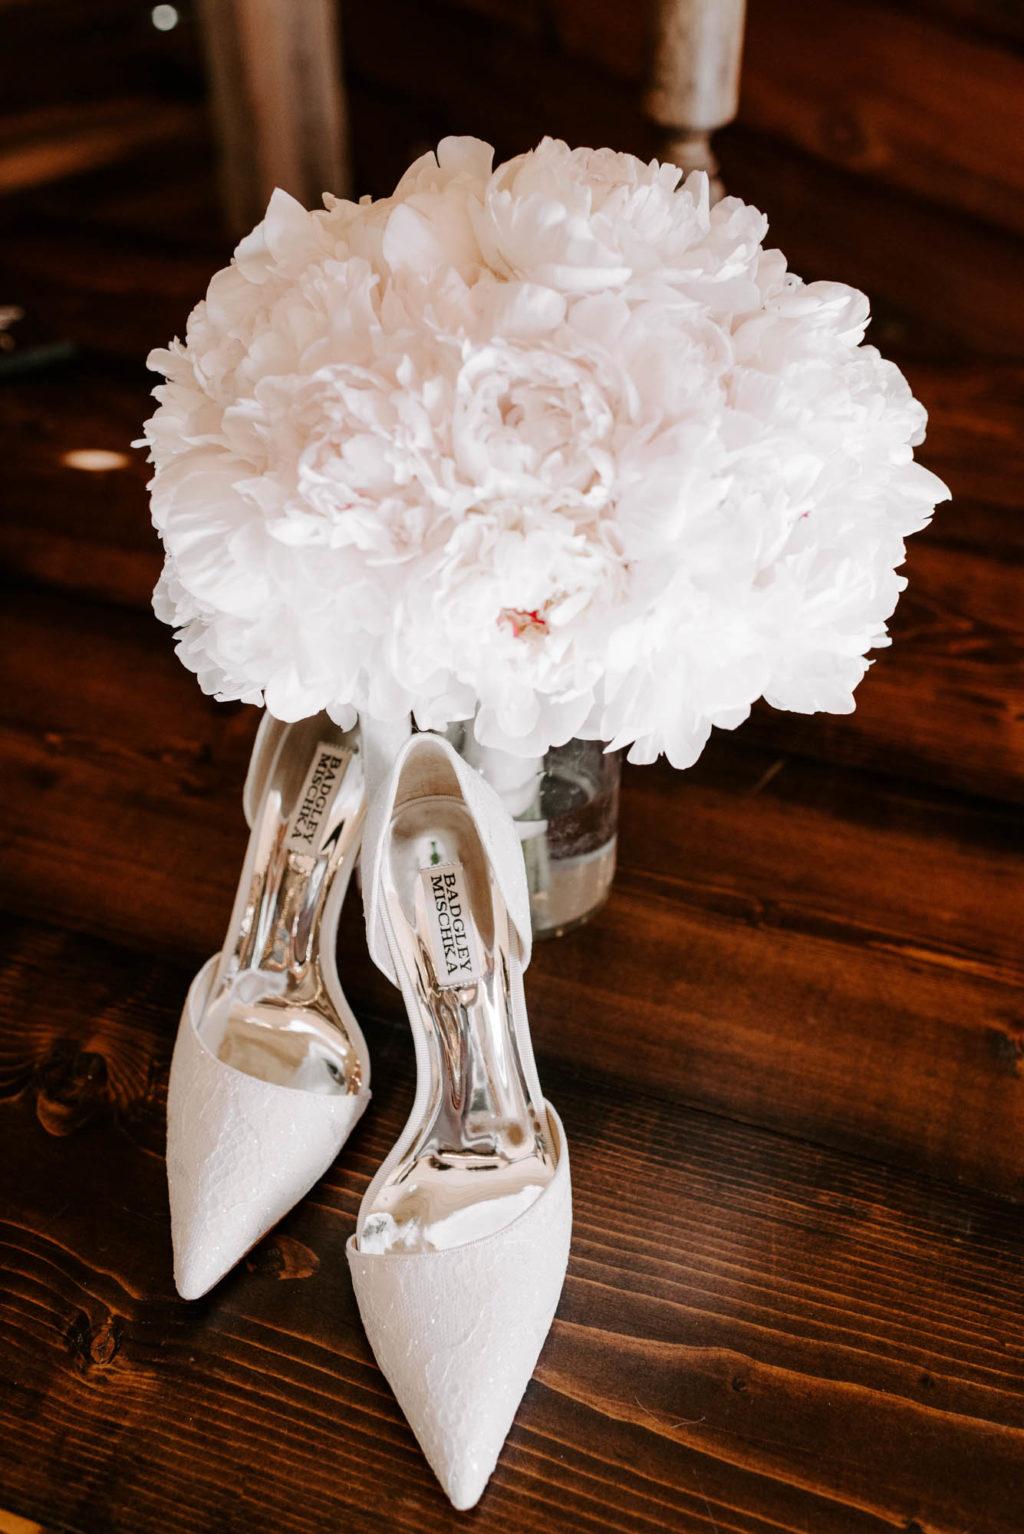 White Peony Bridal Wedding Bouquet with Badgley Mischka Designer White Lace Pumps Bride Shoes